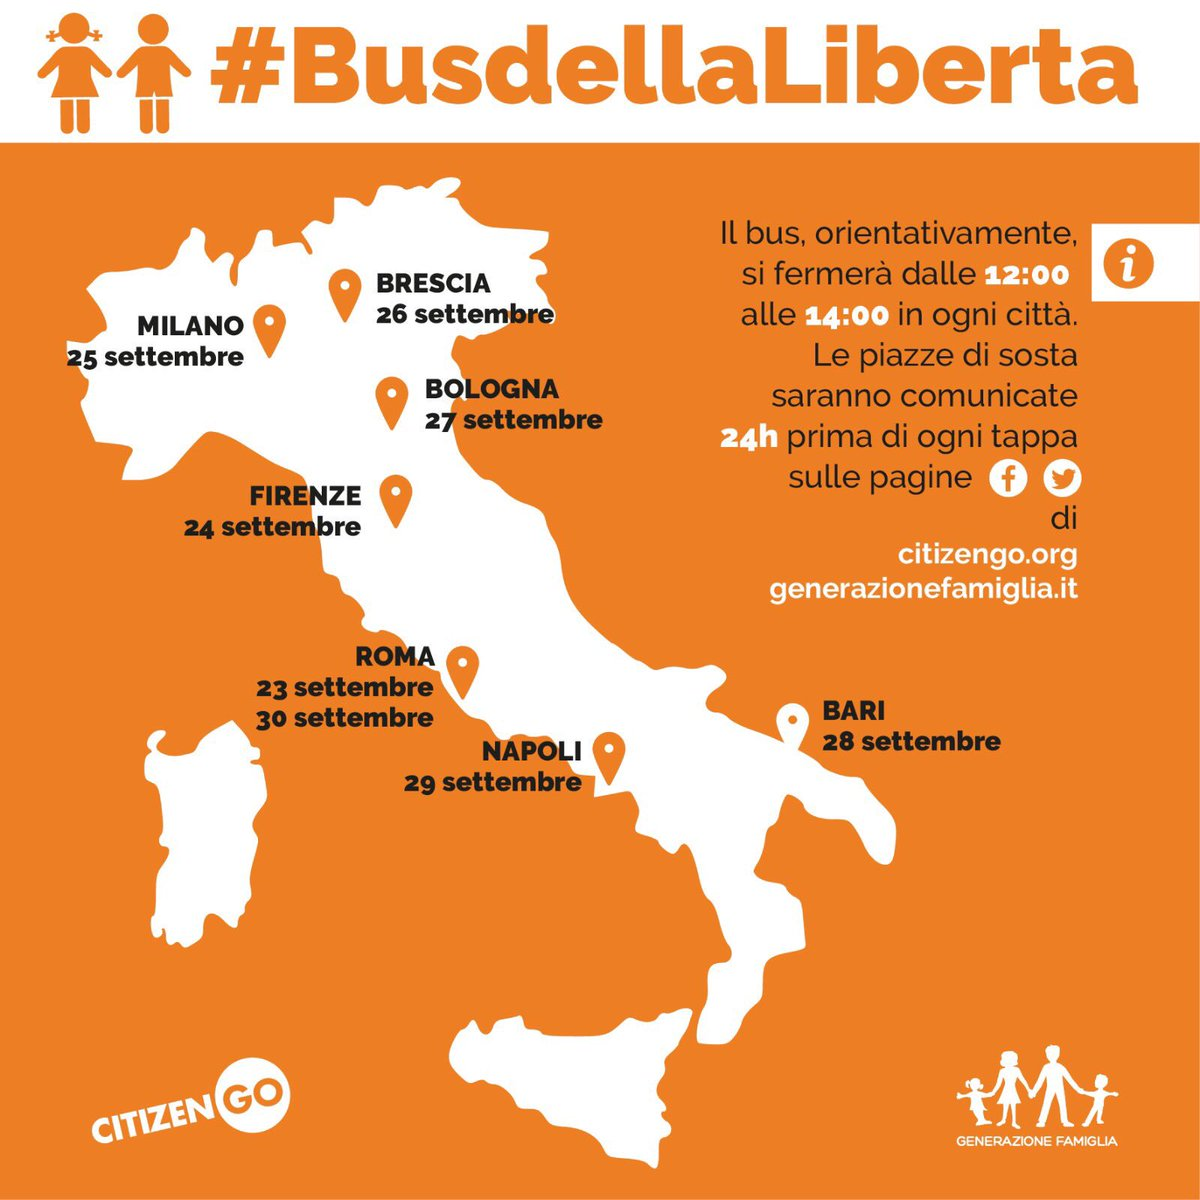 #BusdellaLiberta